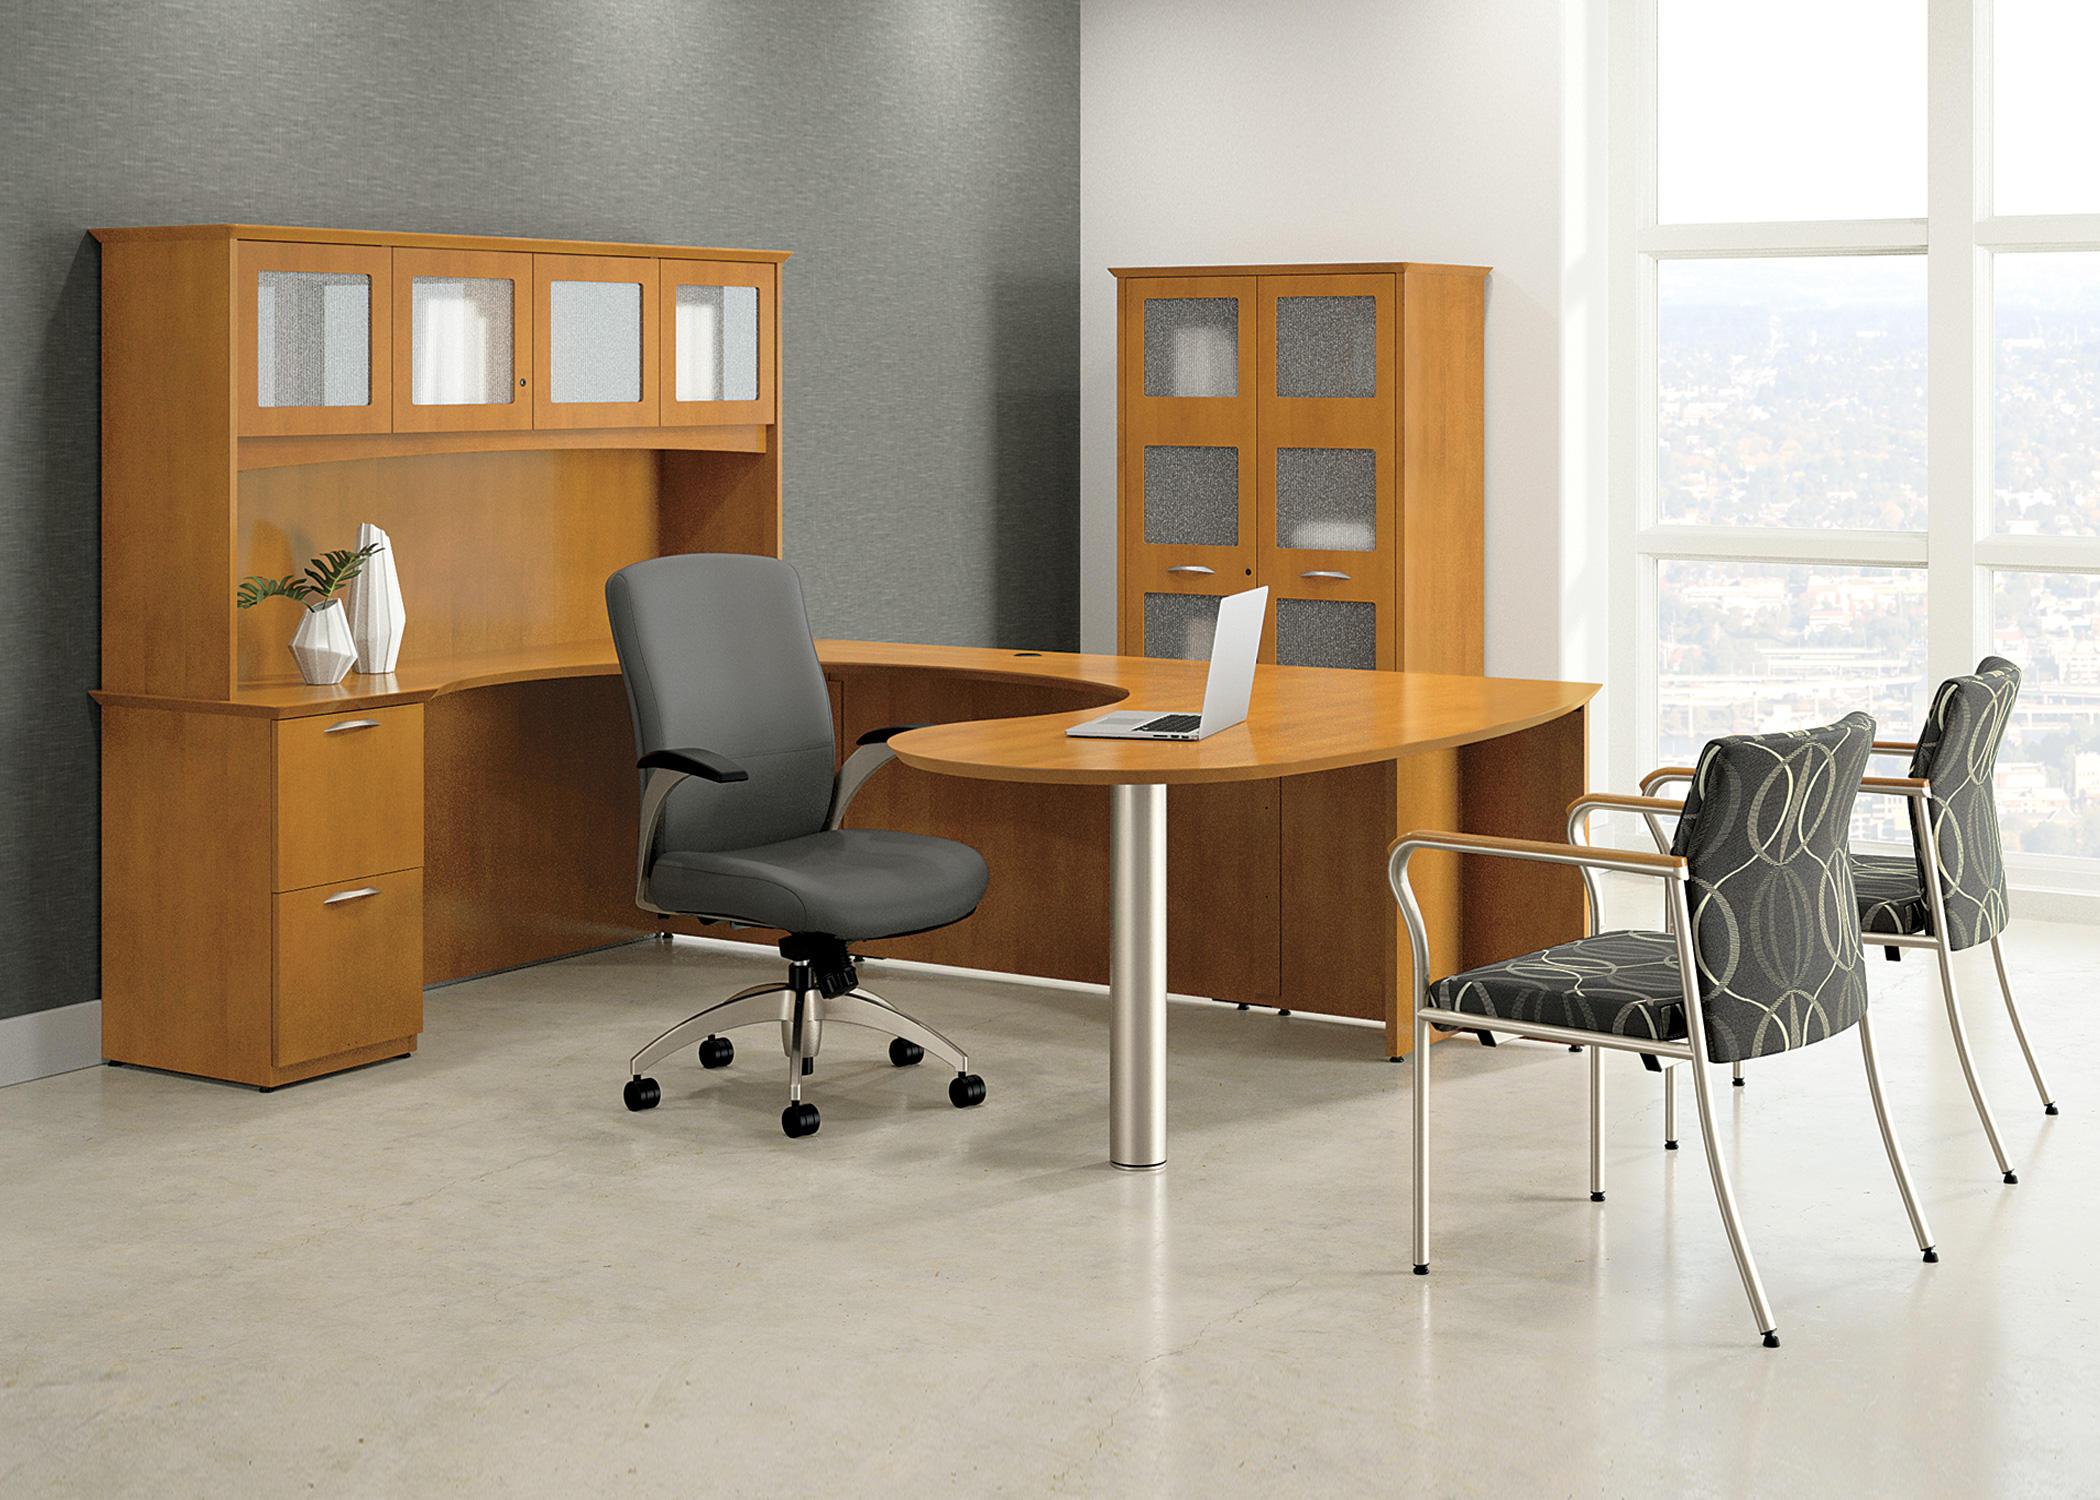 CLEVER DESK - Executive desks from National Office Furniture ...